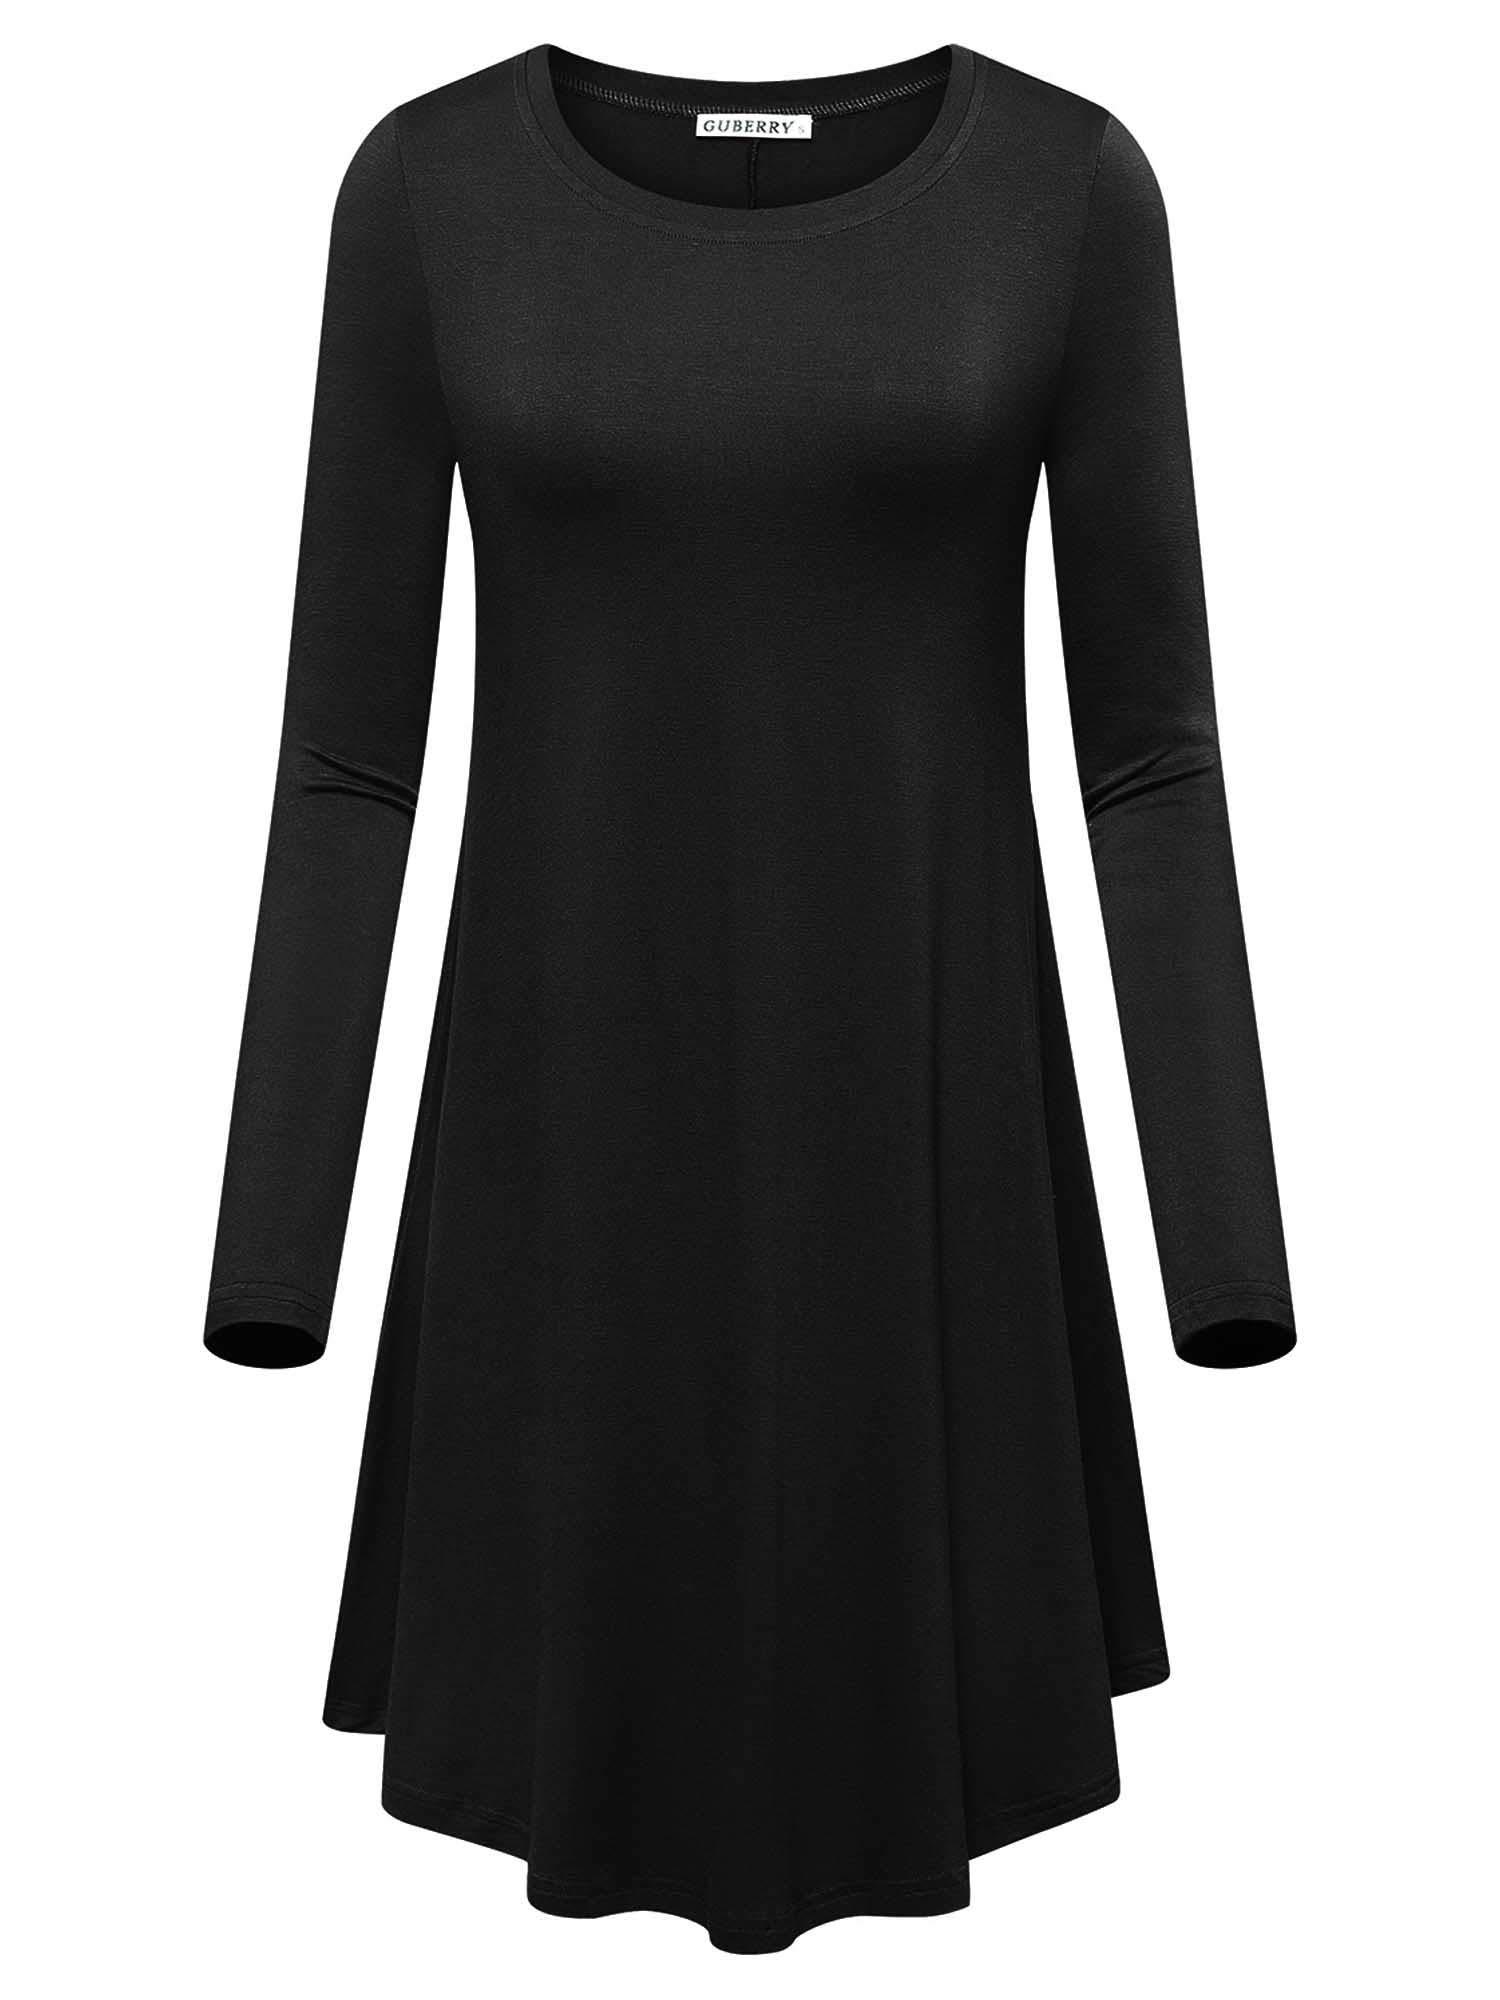 GUBERRY T-Shirt Dresses for Women Black Swing Fall Long Sleeve Casual Midi Dress(Black,XL)